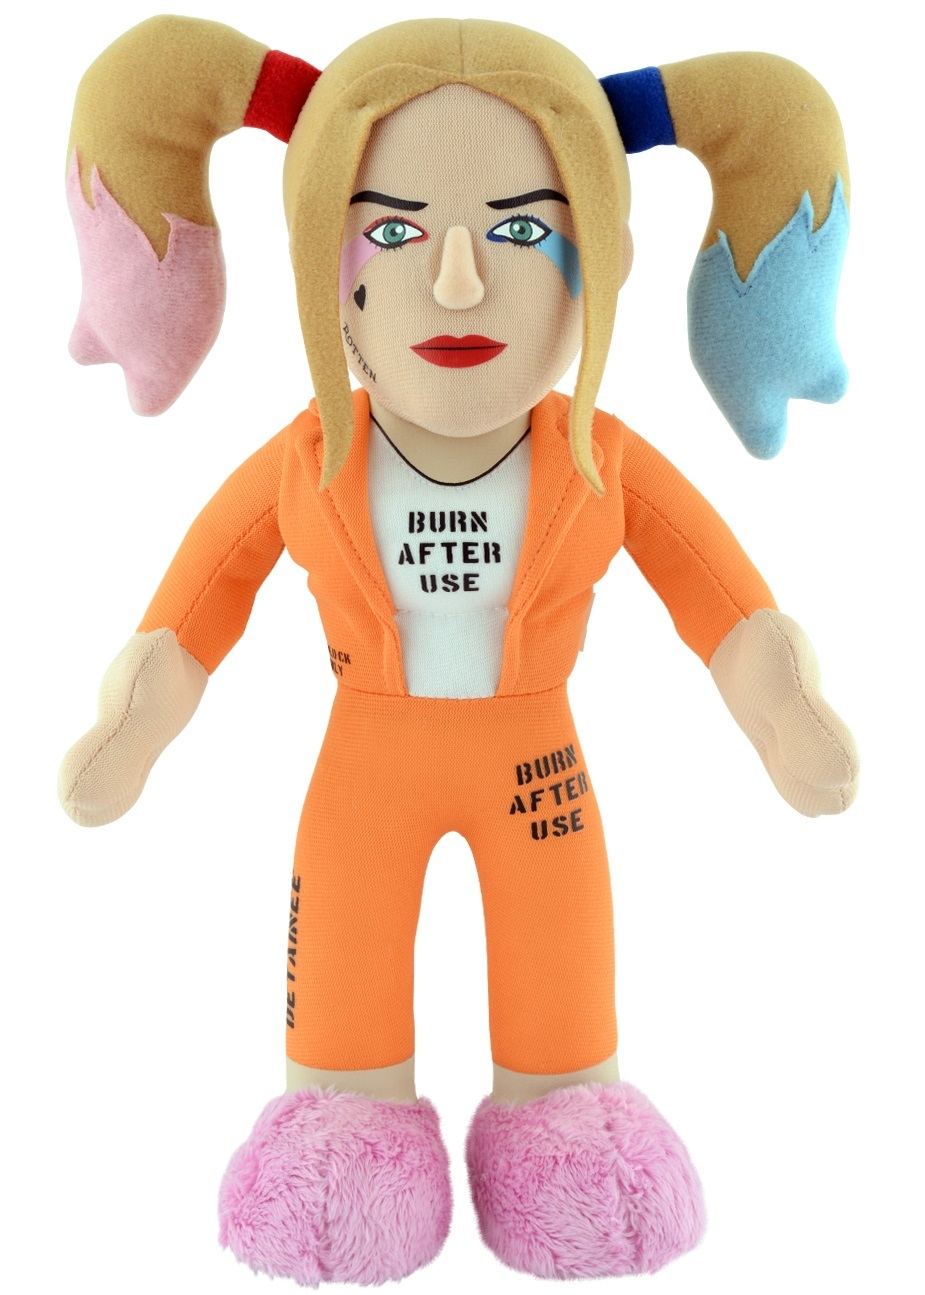 "Bleacher Creatures: Prison Harley Quinn - 10"" Plush Figure image"